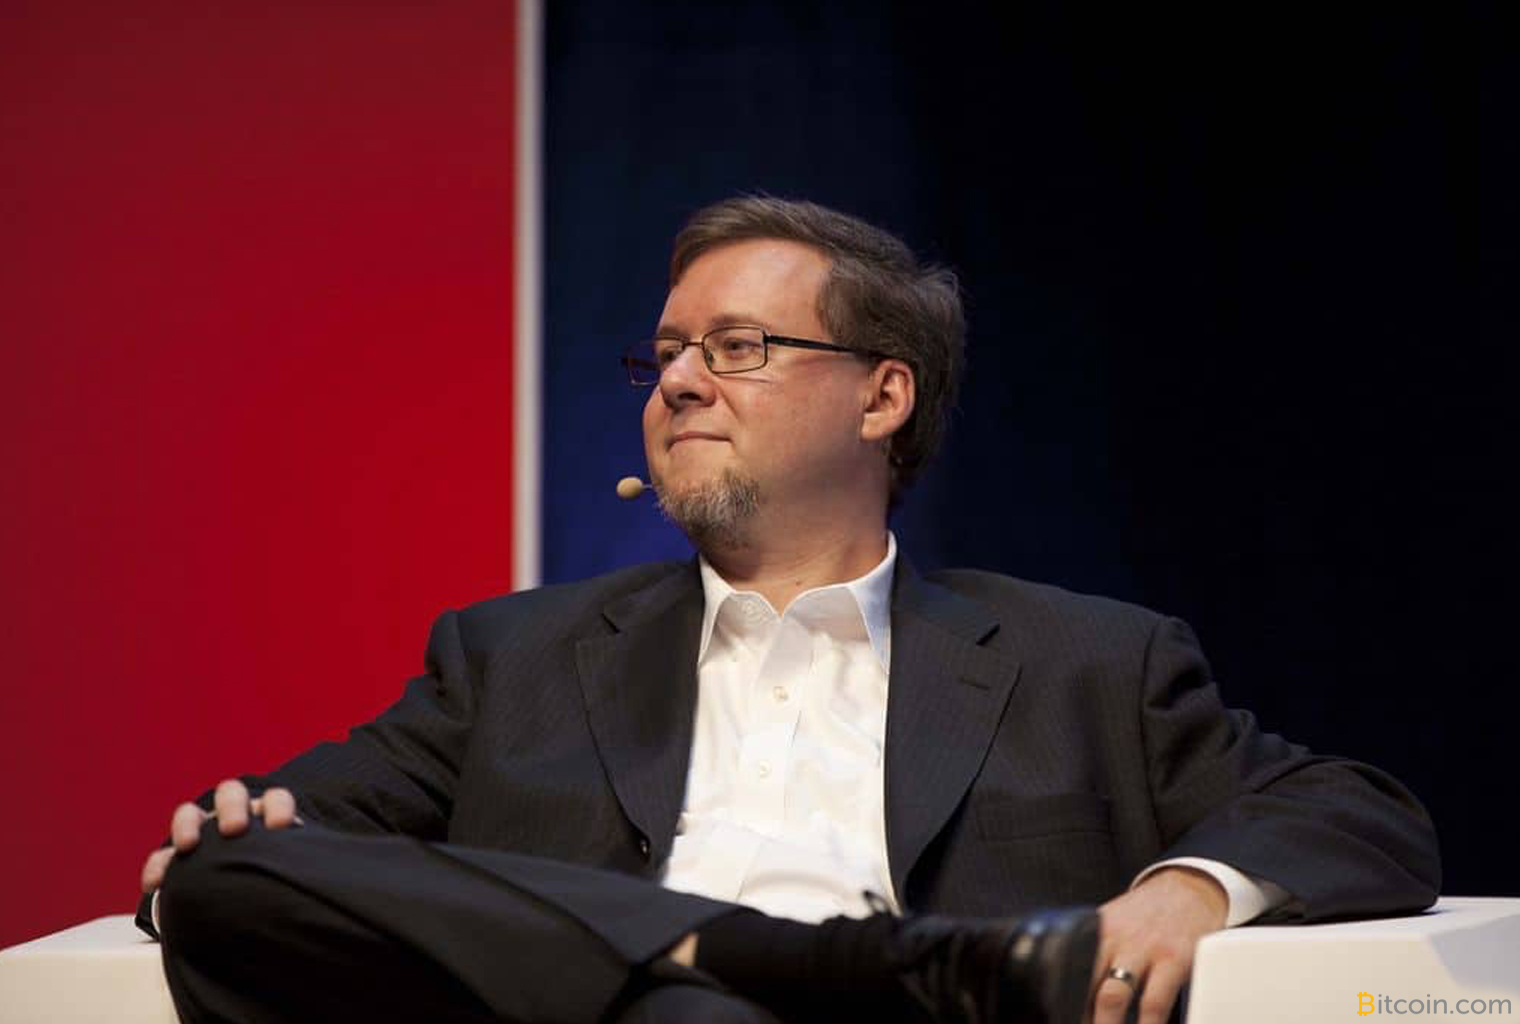 Jeff Garzik Subpoenaed in the Kleiman Bitcoin Lawsuit Against Craig Wright